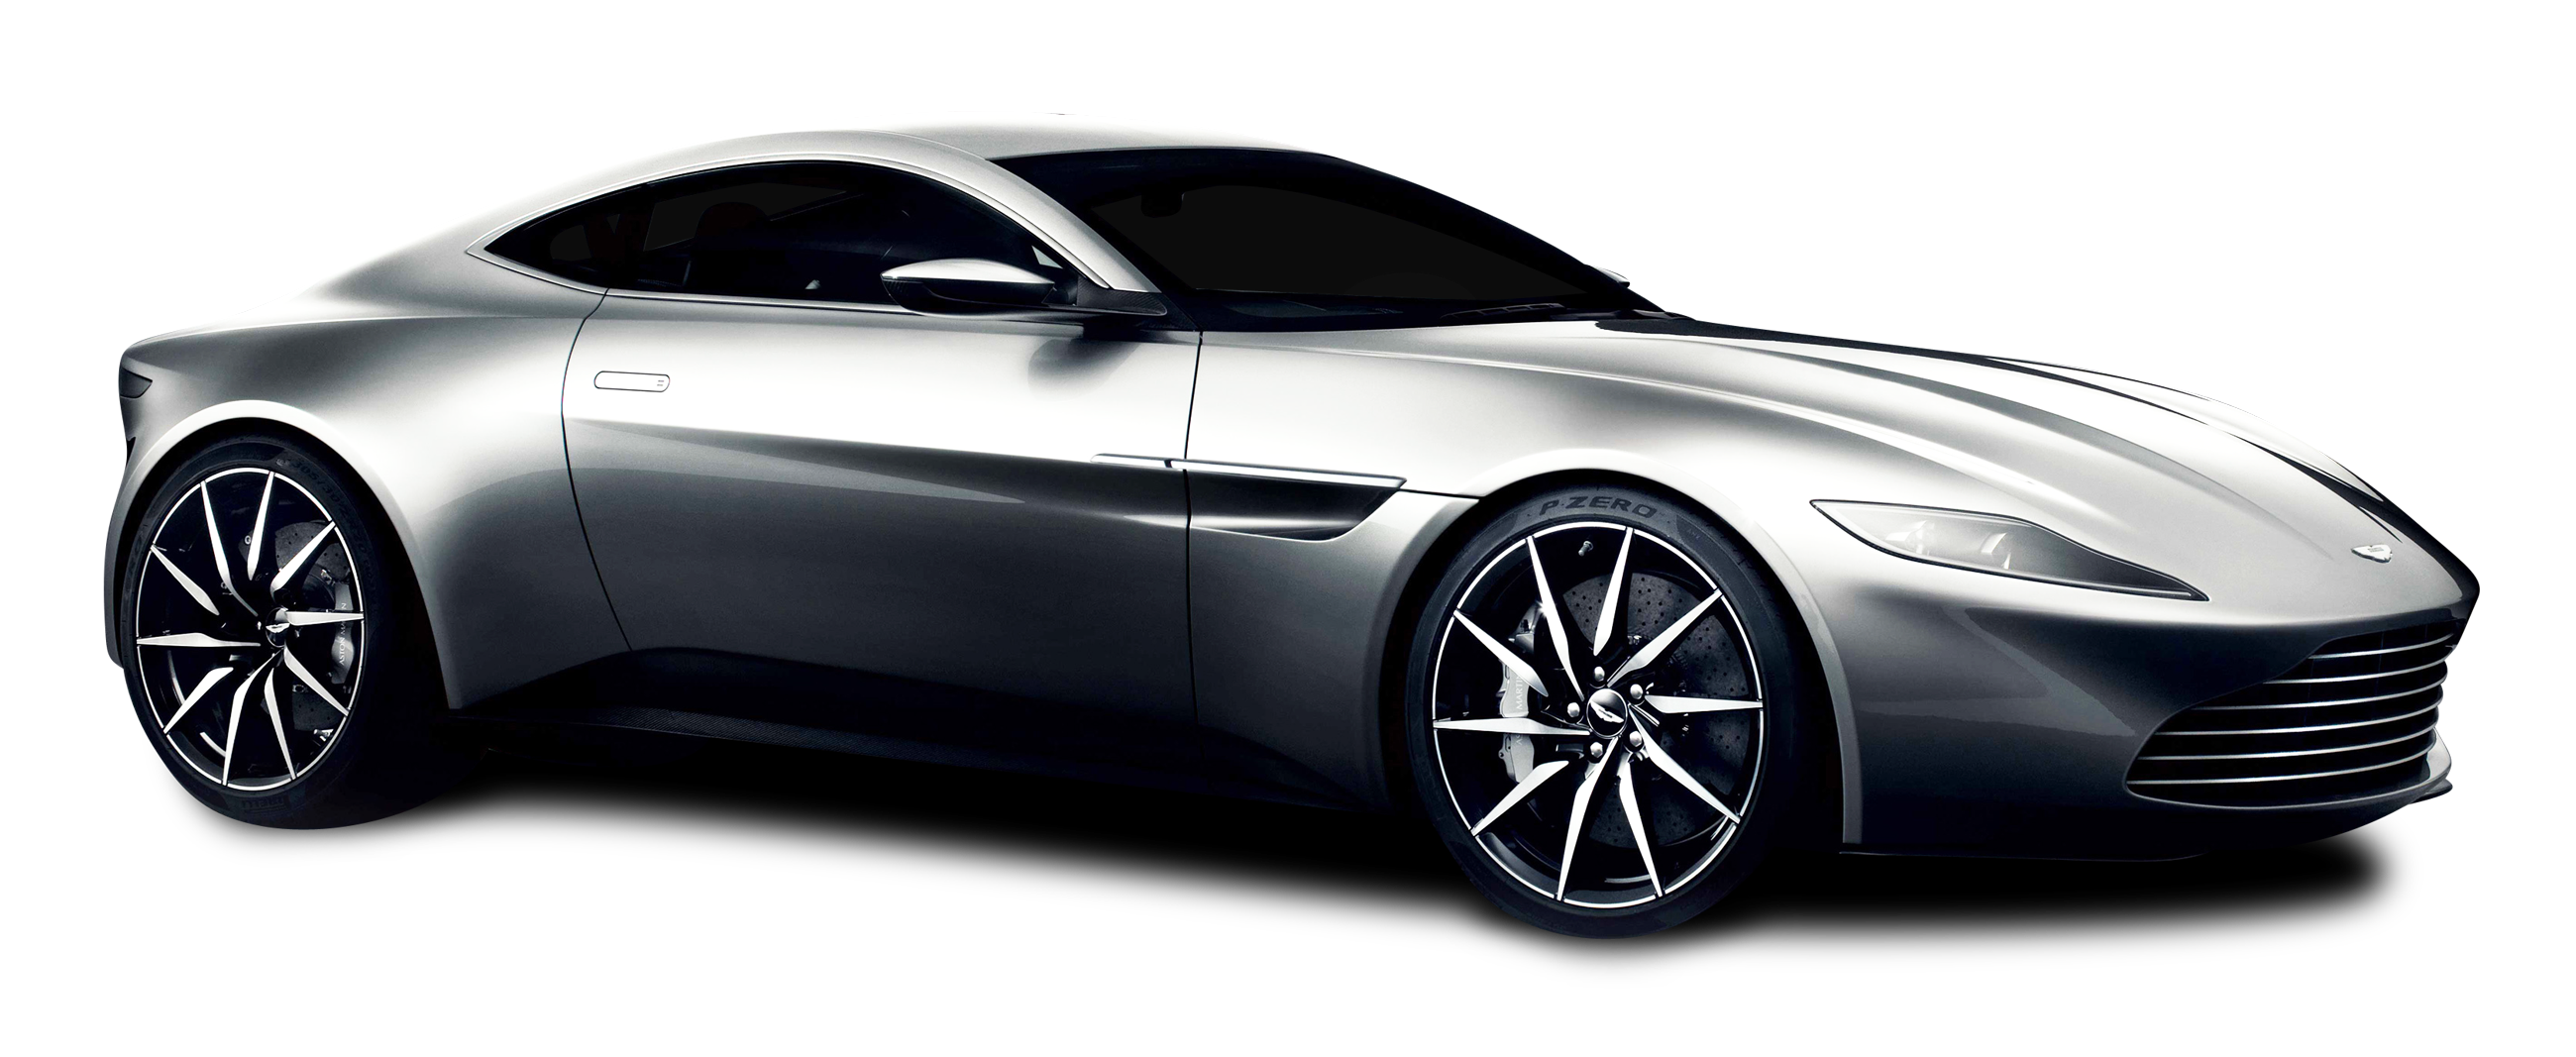 Aston Martin DB10 Silver Car